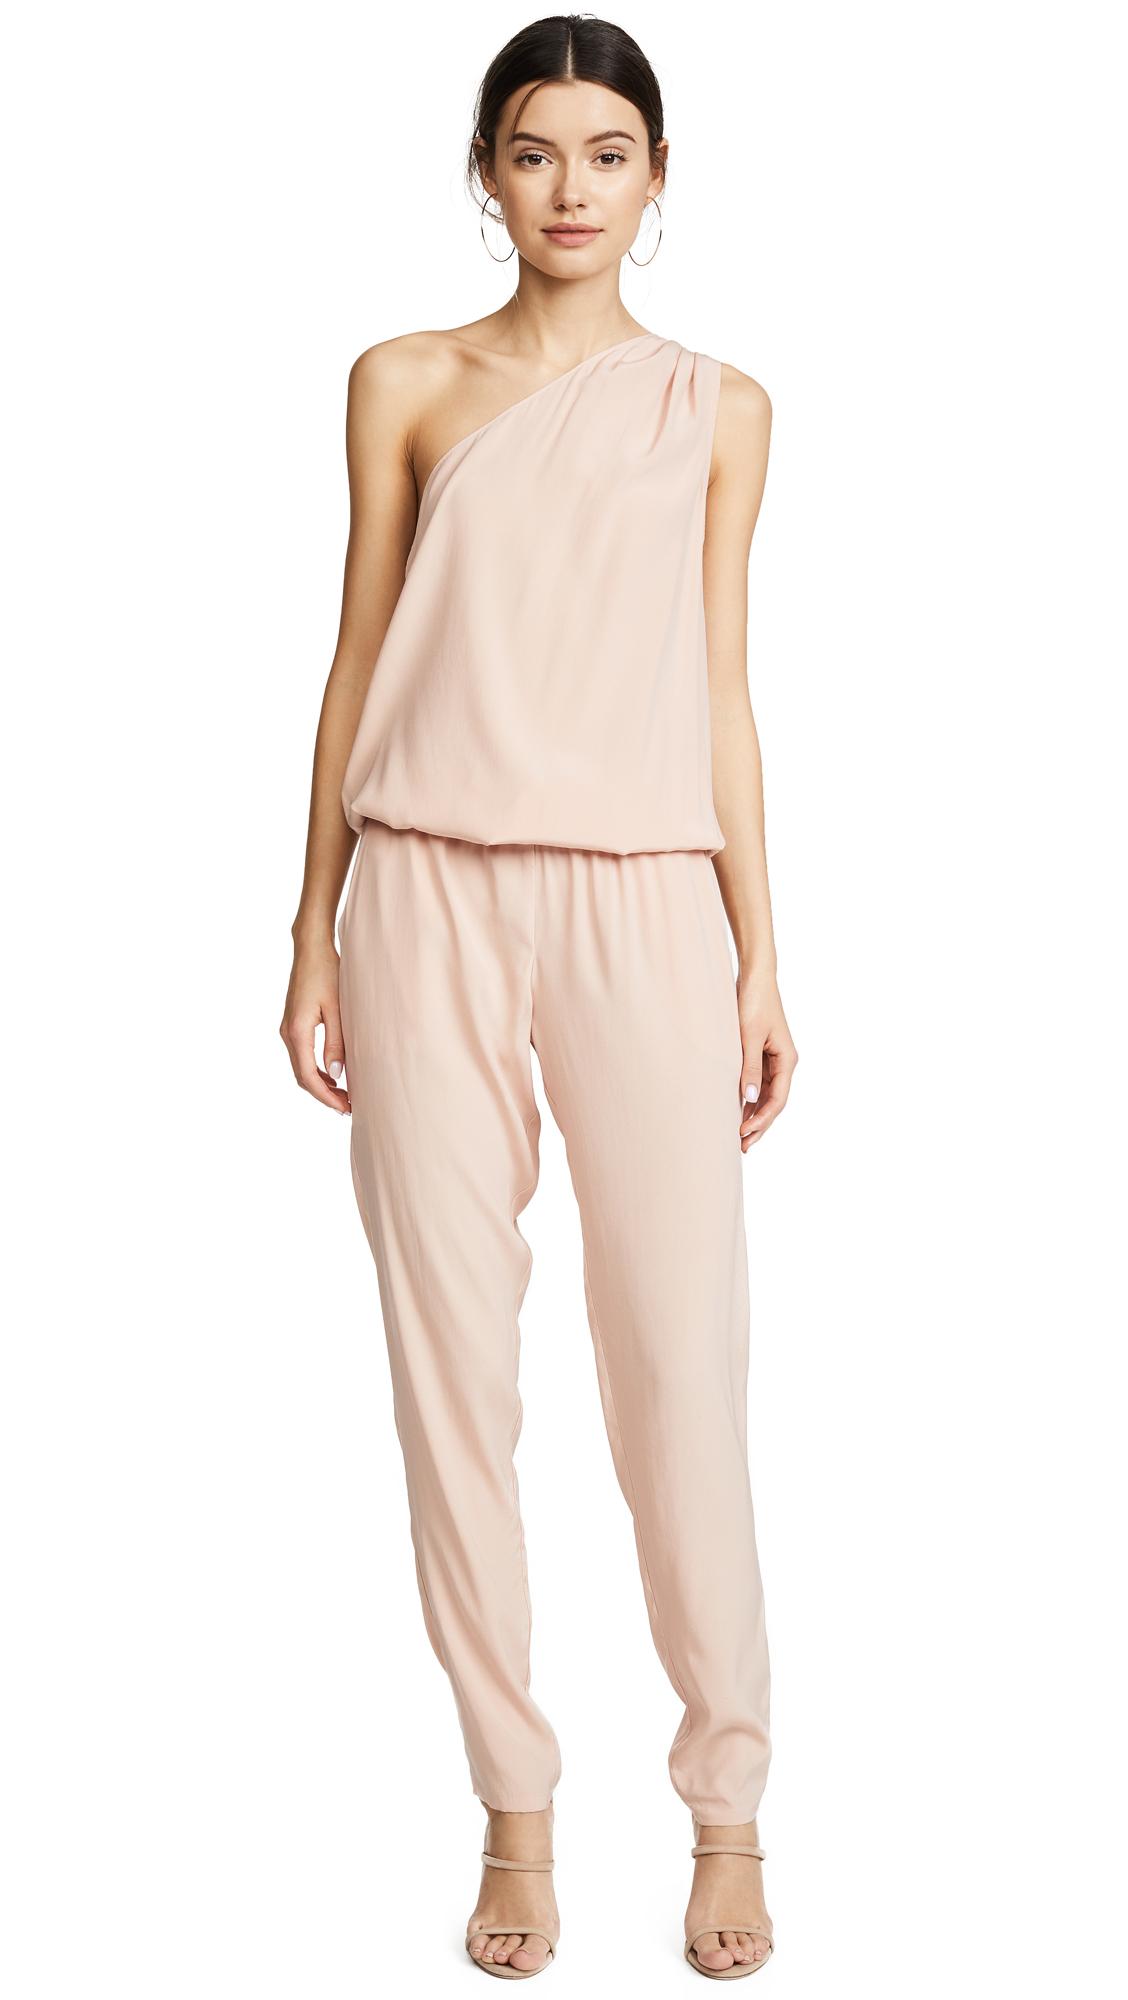 Ramy Brook Lulu One Shoulder Jumpsuit - Blush